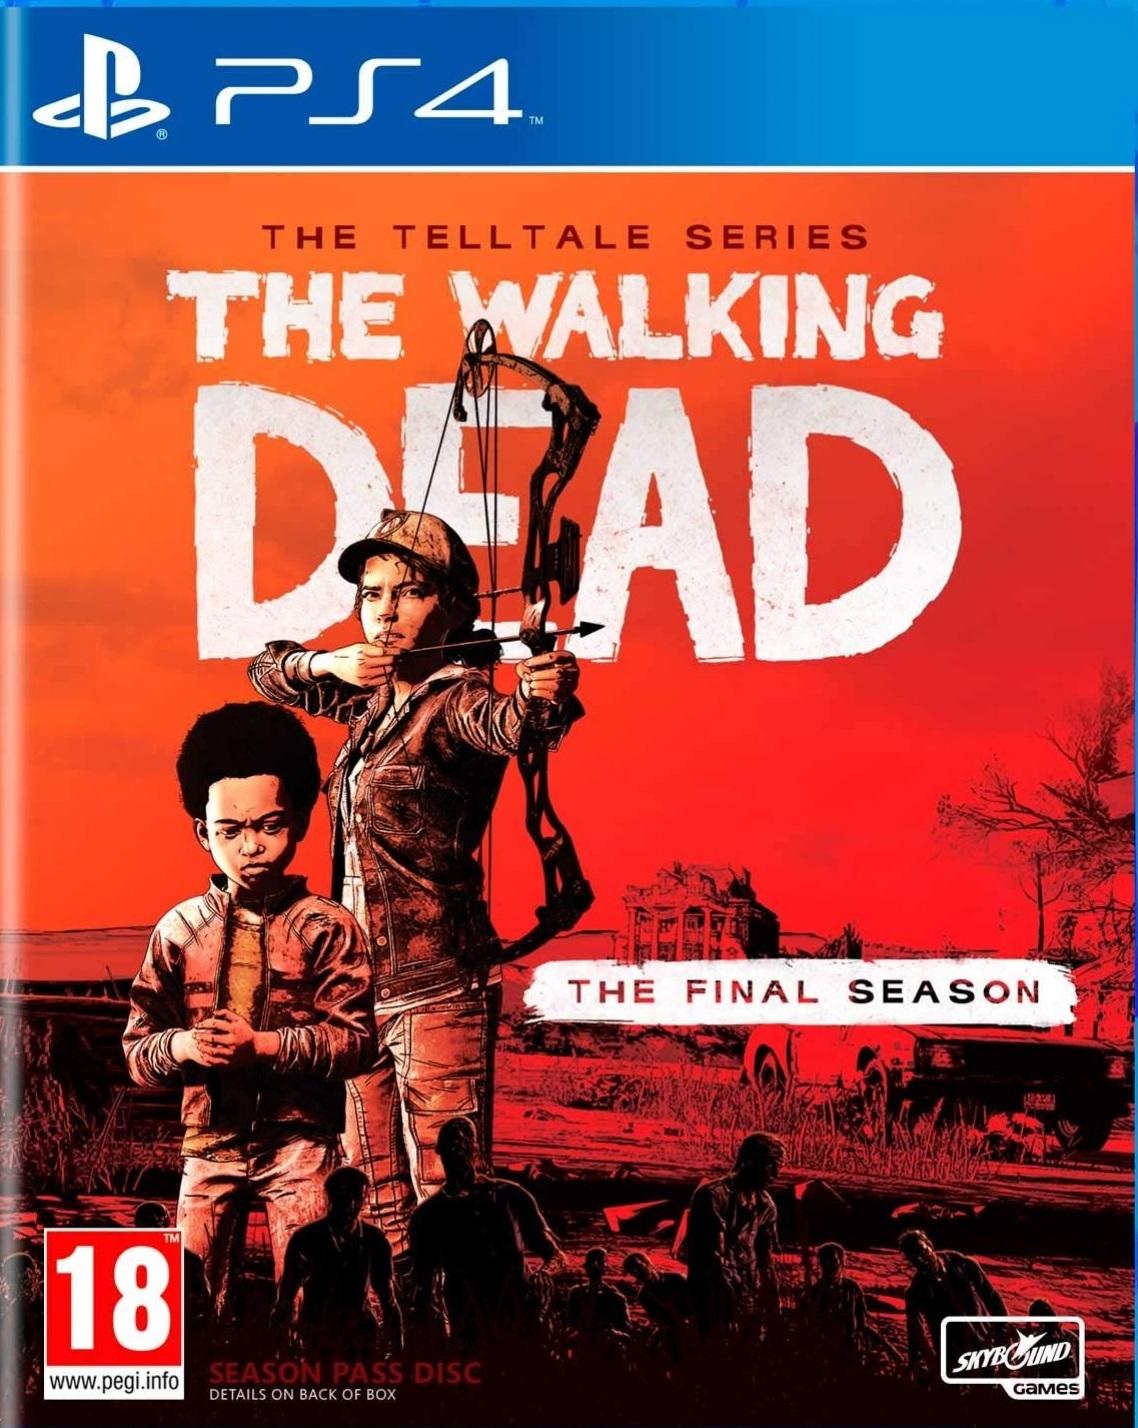 the-walking-dead-the-telltale-series-the-final-season-585163.5.jpg